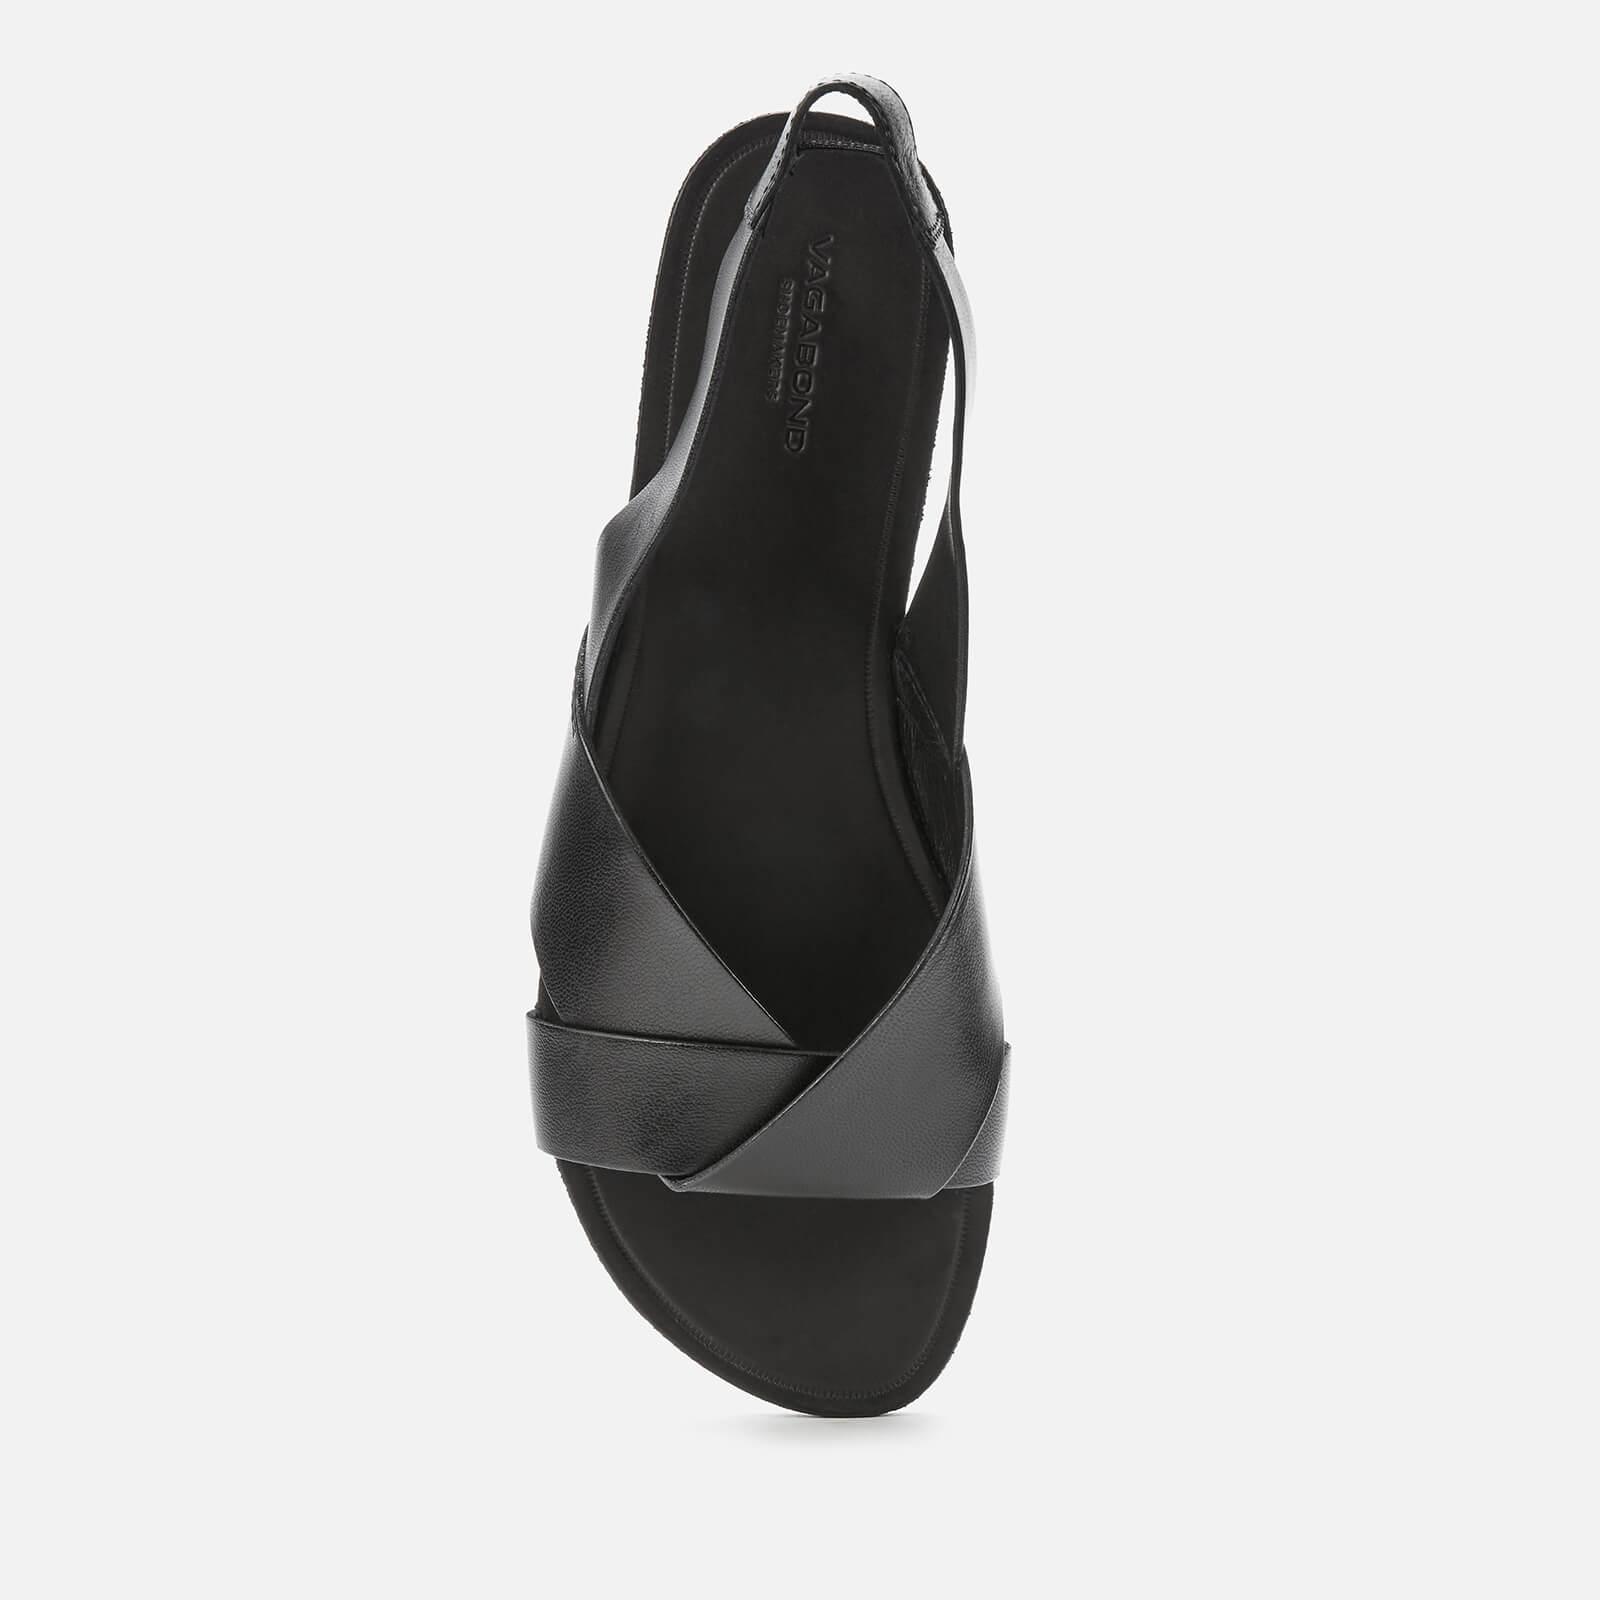 Vagabond Women's Tia Leather Flat Sandals - Black - Uk 4